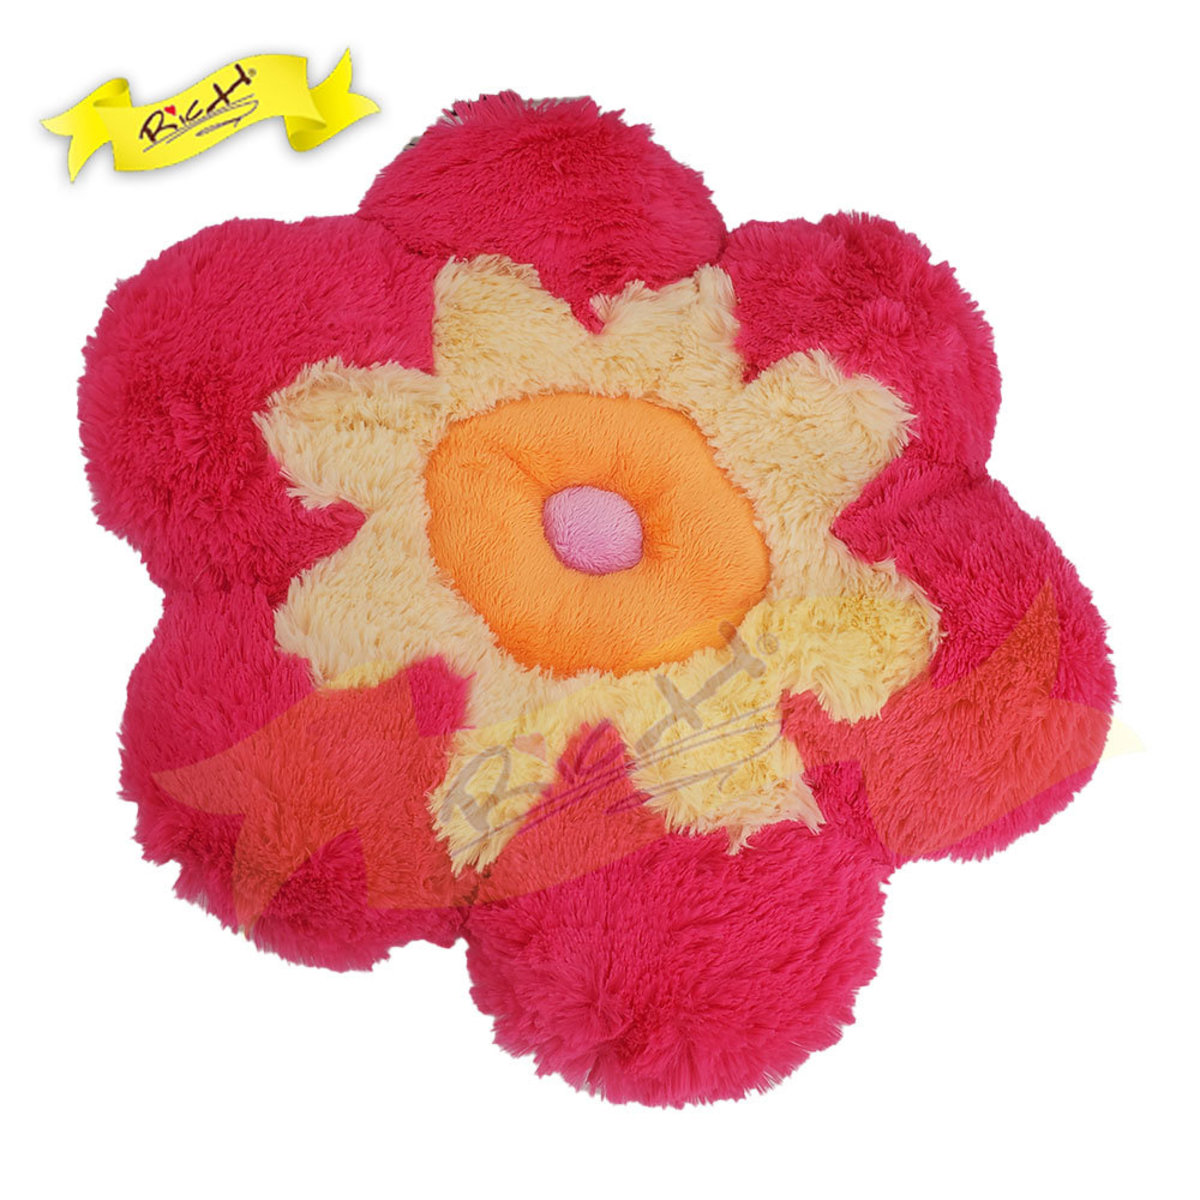 Color Rich - Bolster Pillow Cushion Hotpink Flower